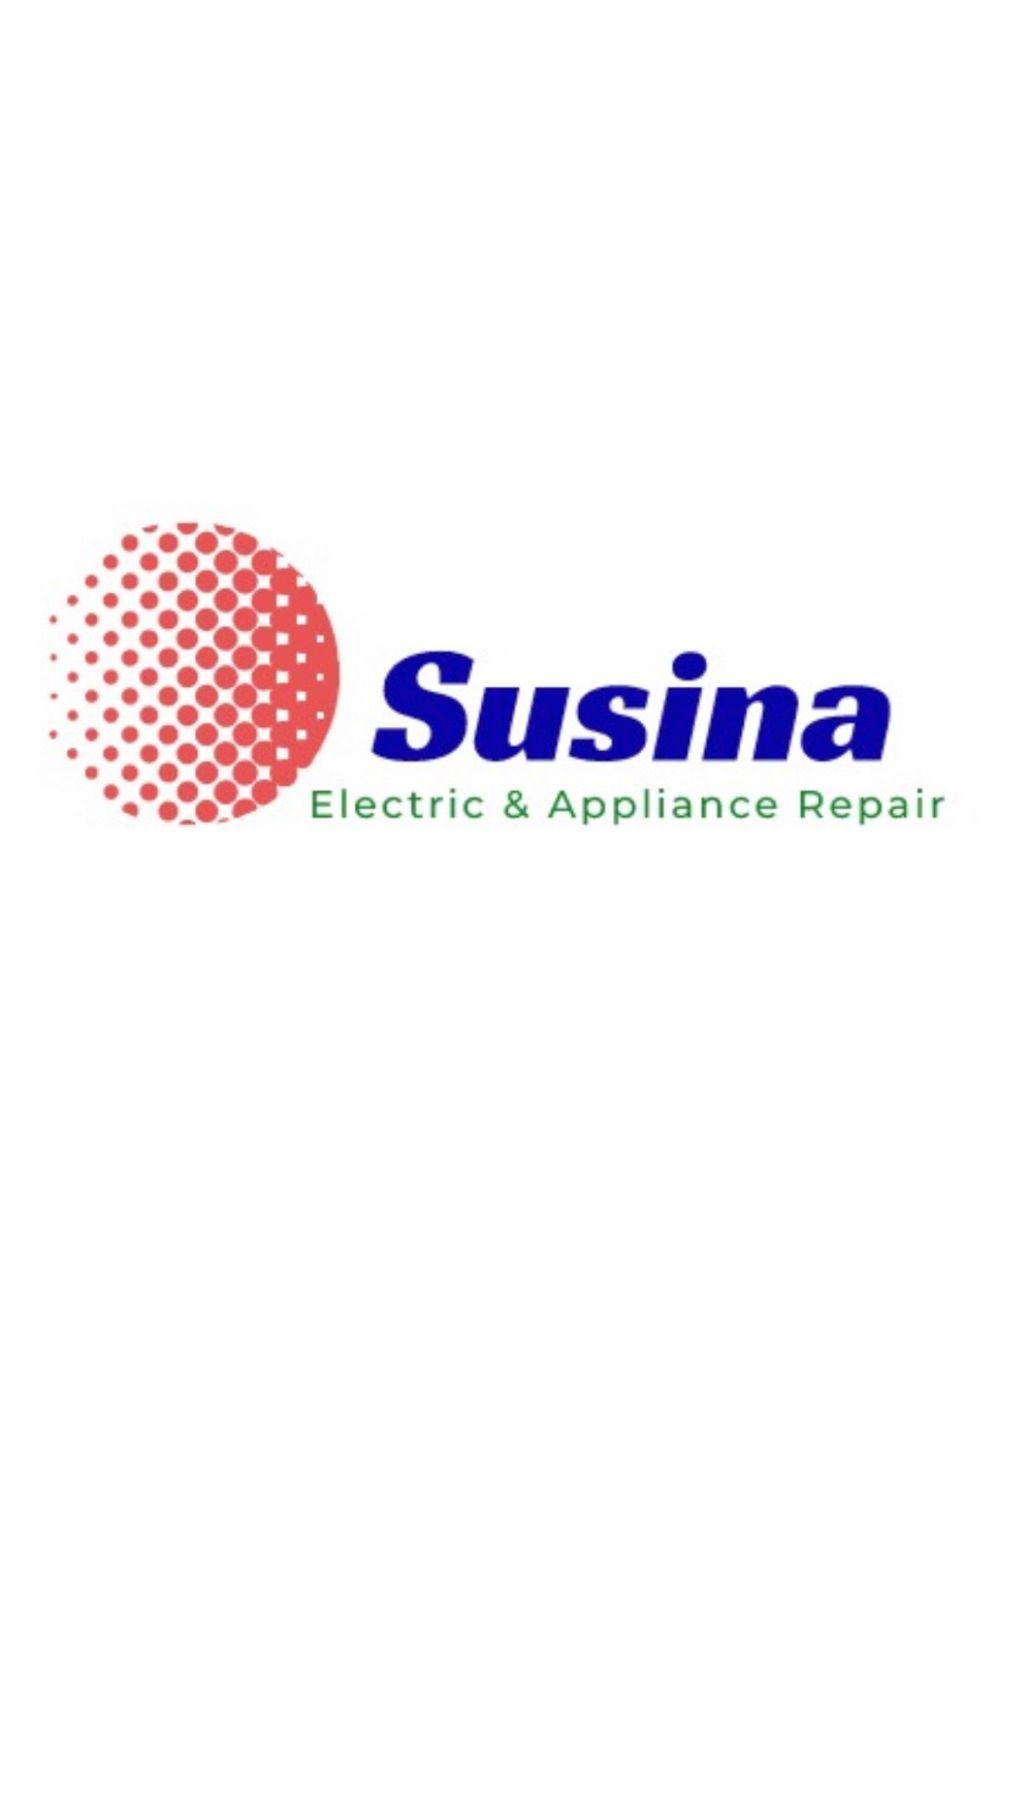 SUSINA  ELECTRIC & APPLIANCE REPAIR, LLC.